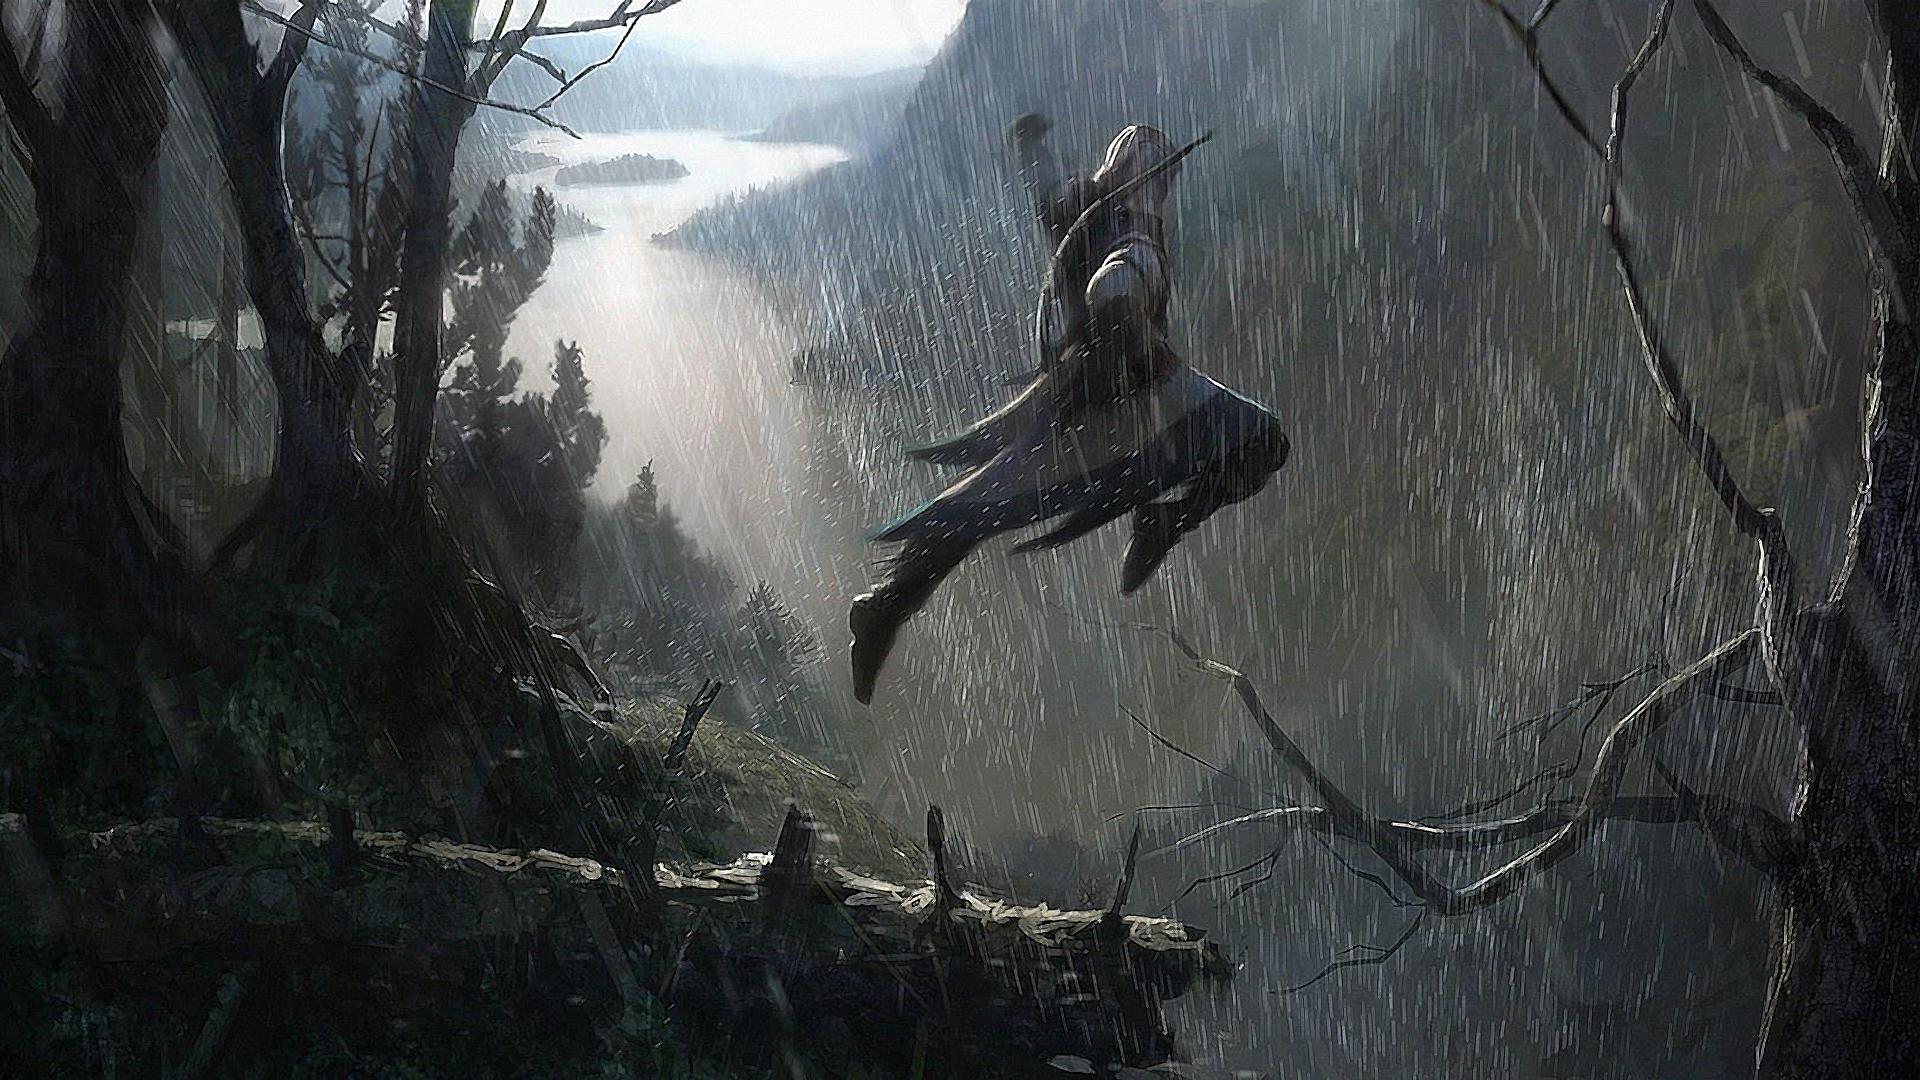 Assassins creed 3 full hd wallpaper and background image video game assassins creed iii wallpaper voltagebd Choice Image